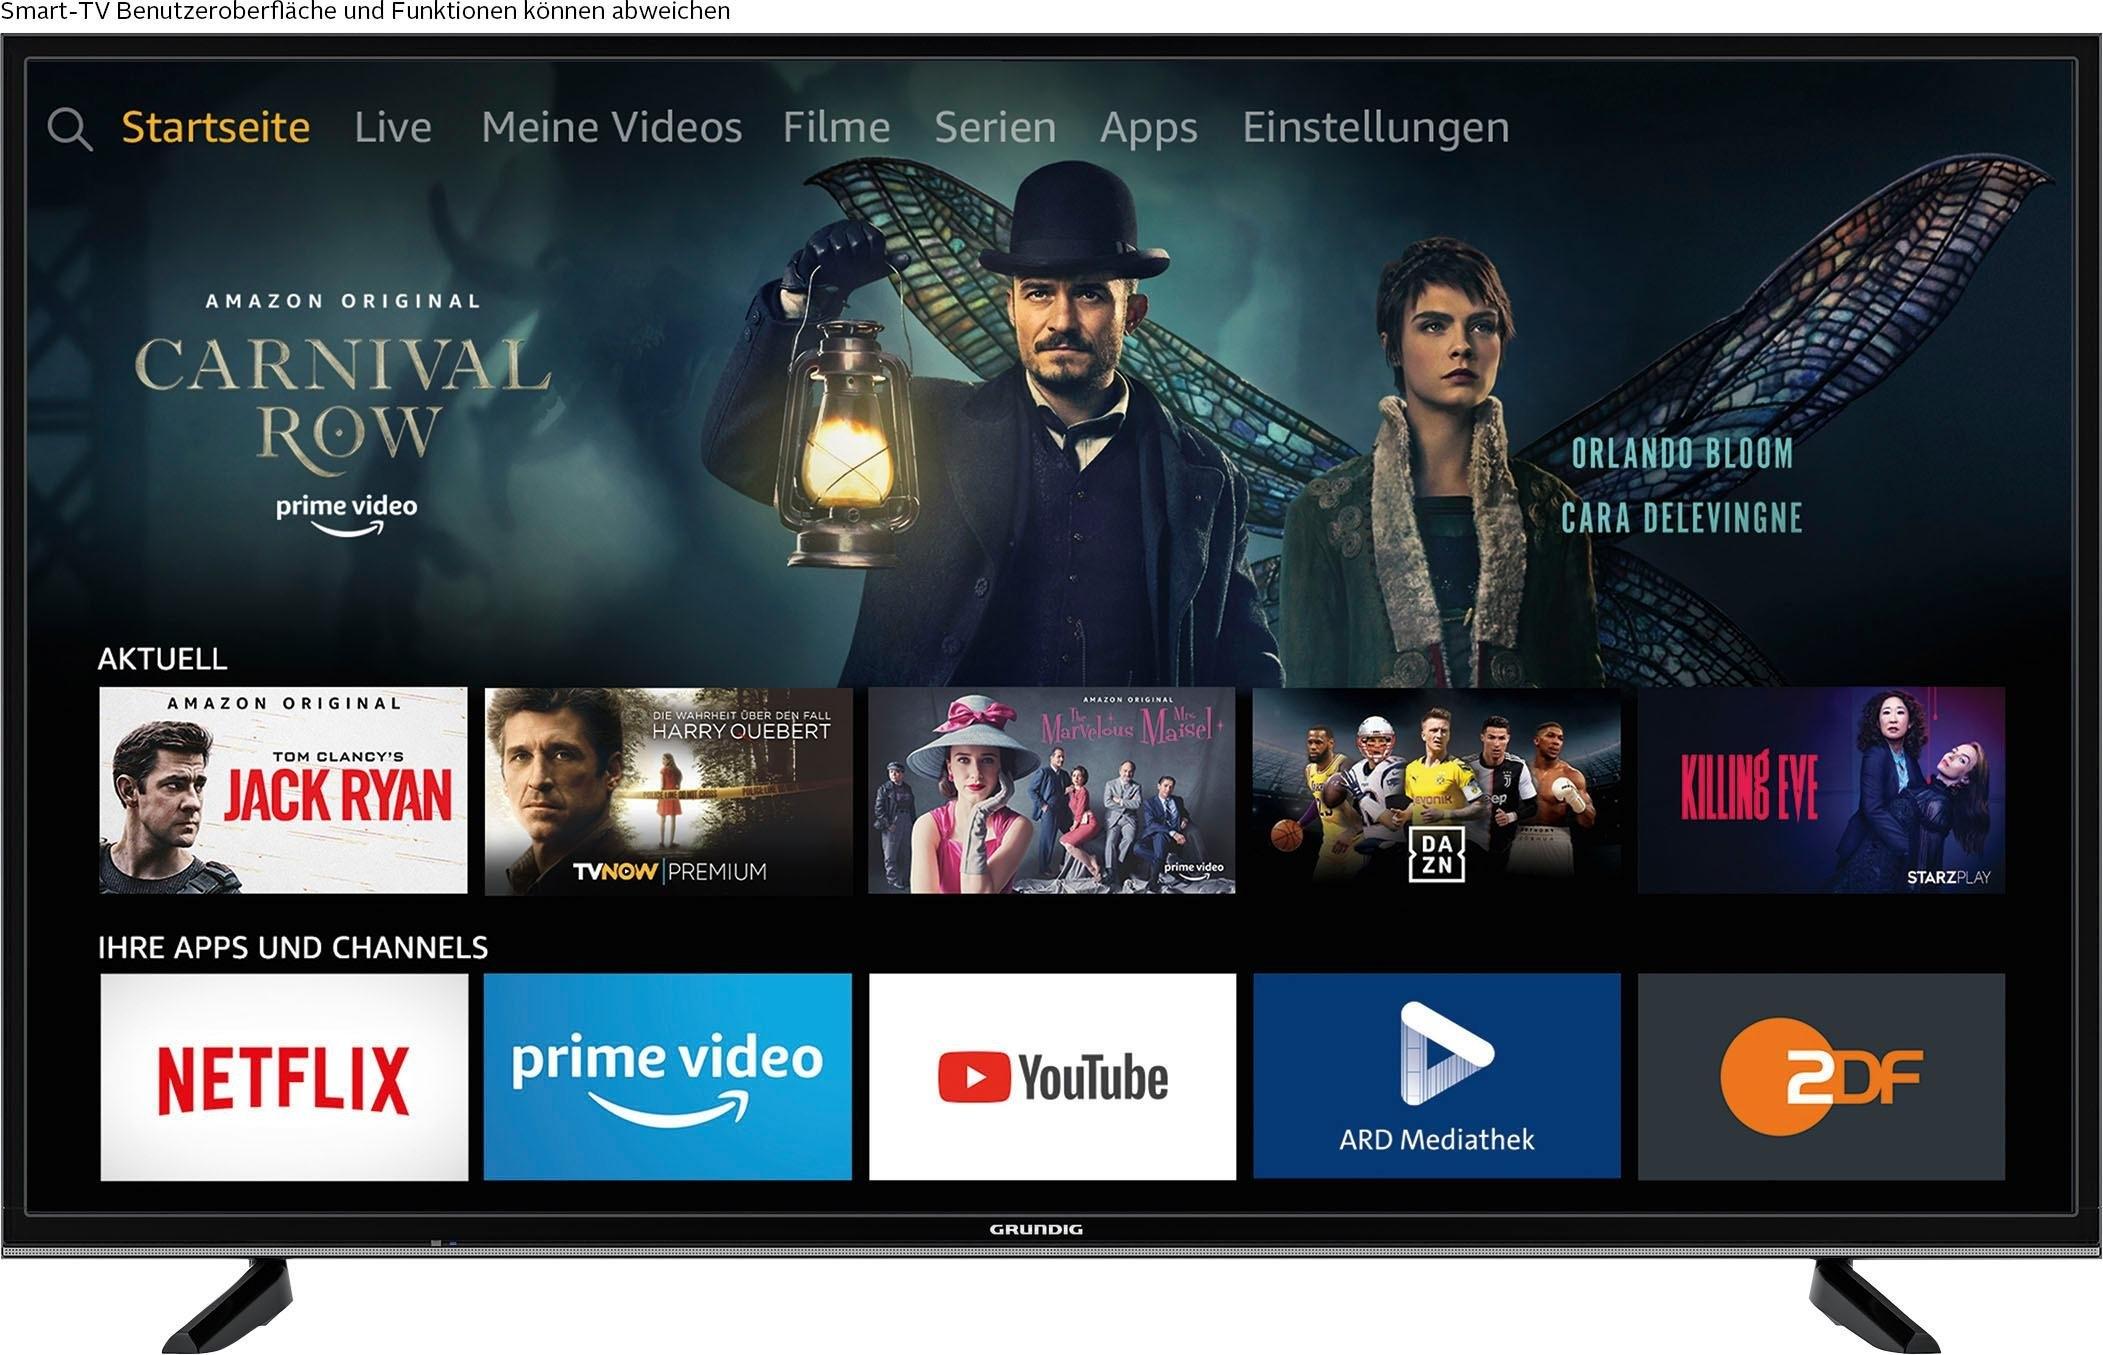 Grundig 49 VLX 7020 led-tv (123 cm / 49 inch), 4K Ultra HD, smart-tv - verschillende betaalmethodes